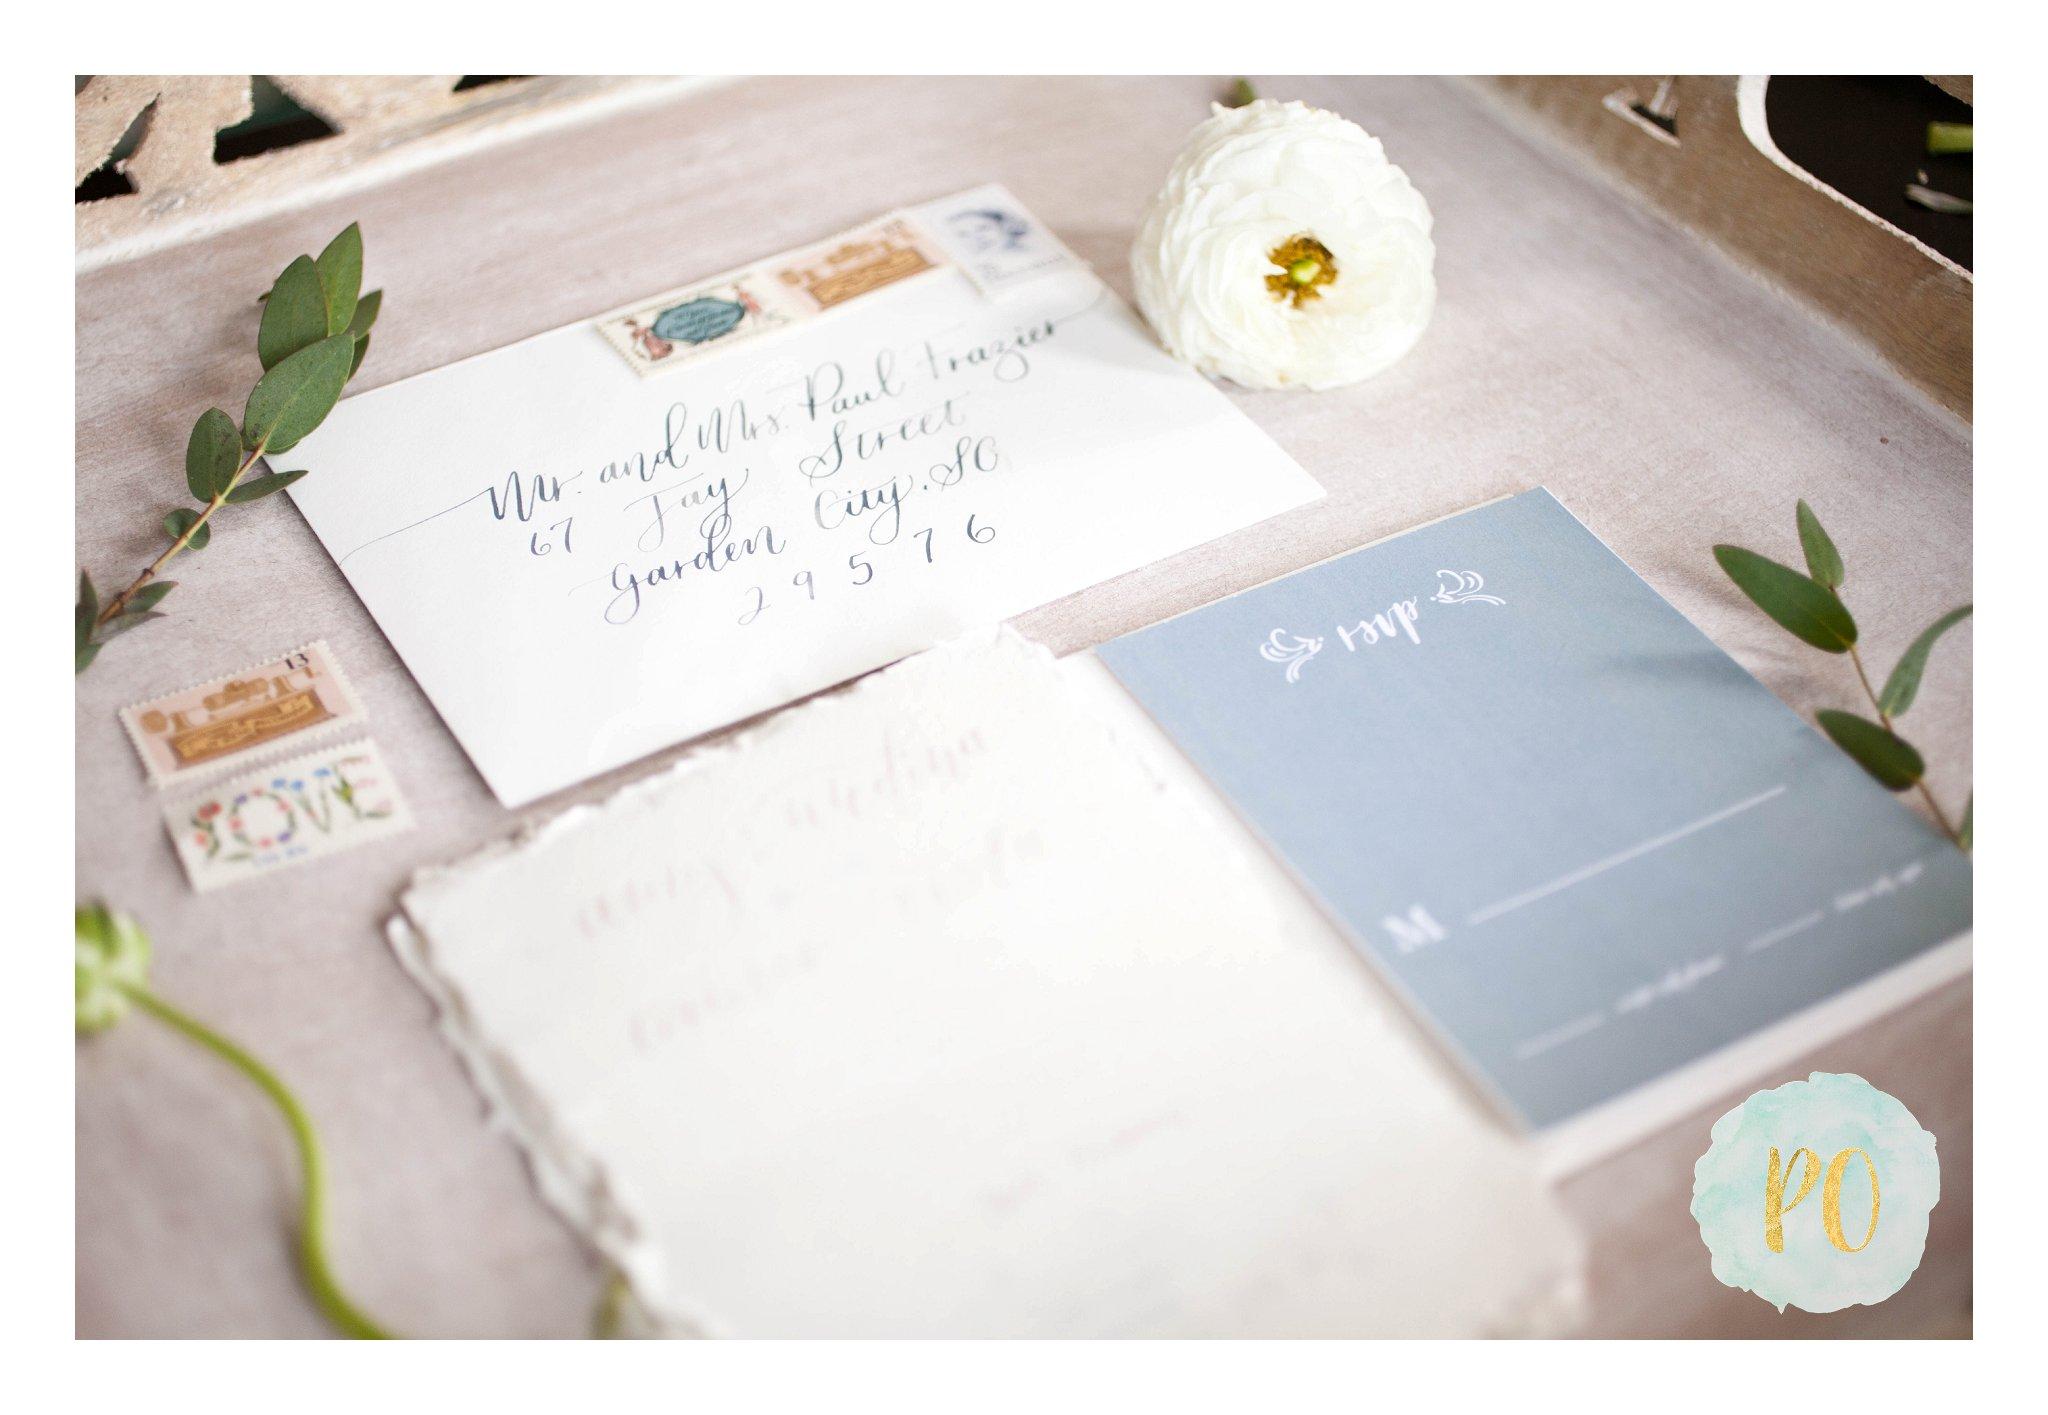 litchfield-plantation-wedding-invitation-pawleys-island-sc-photos_0034.jpg